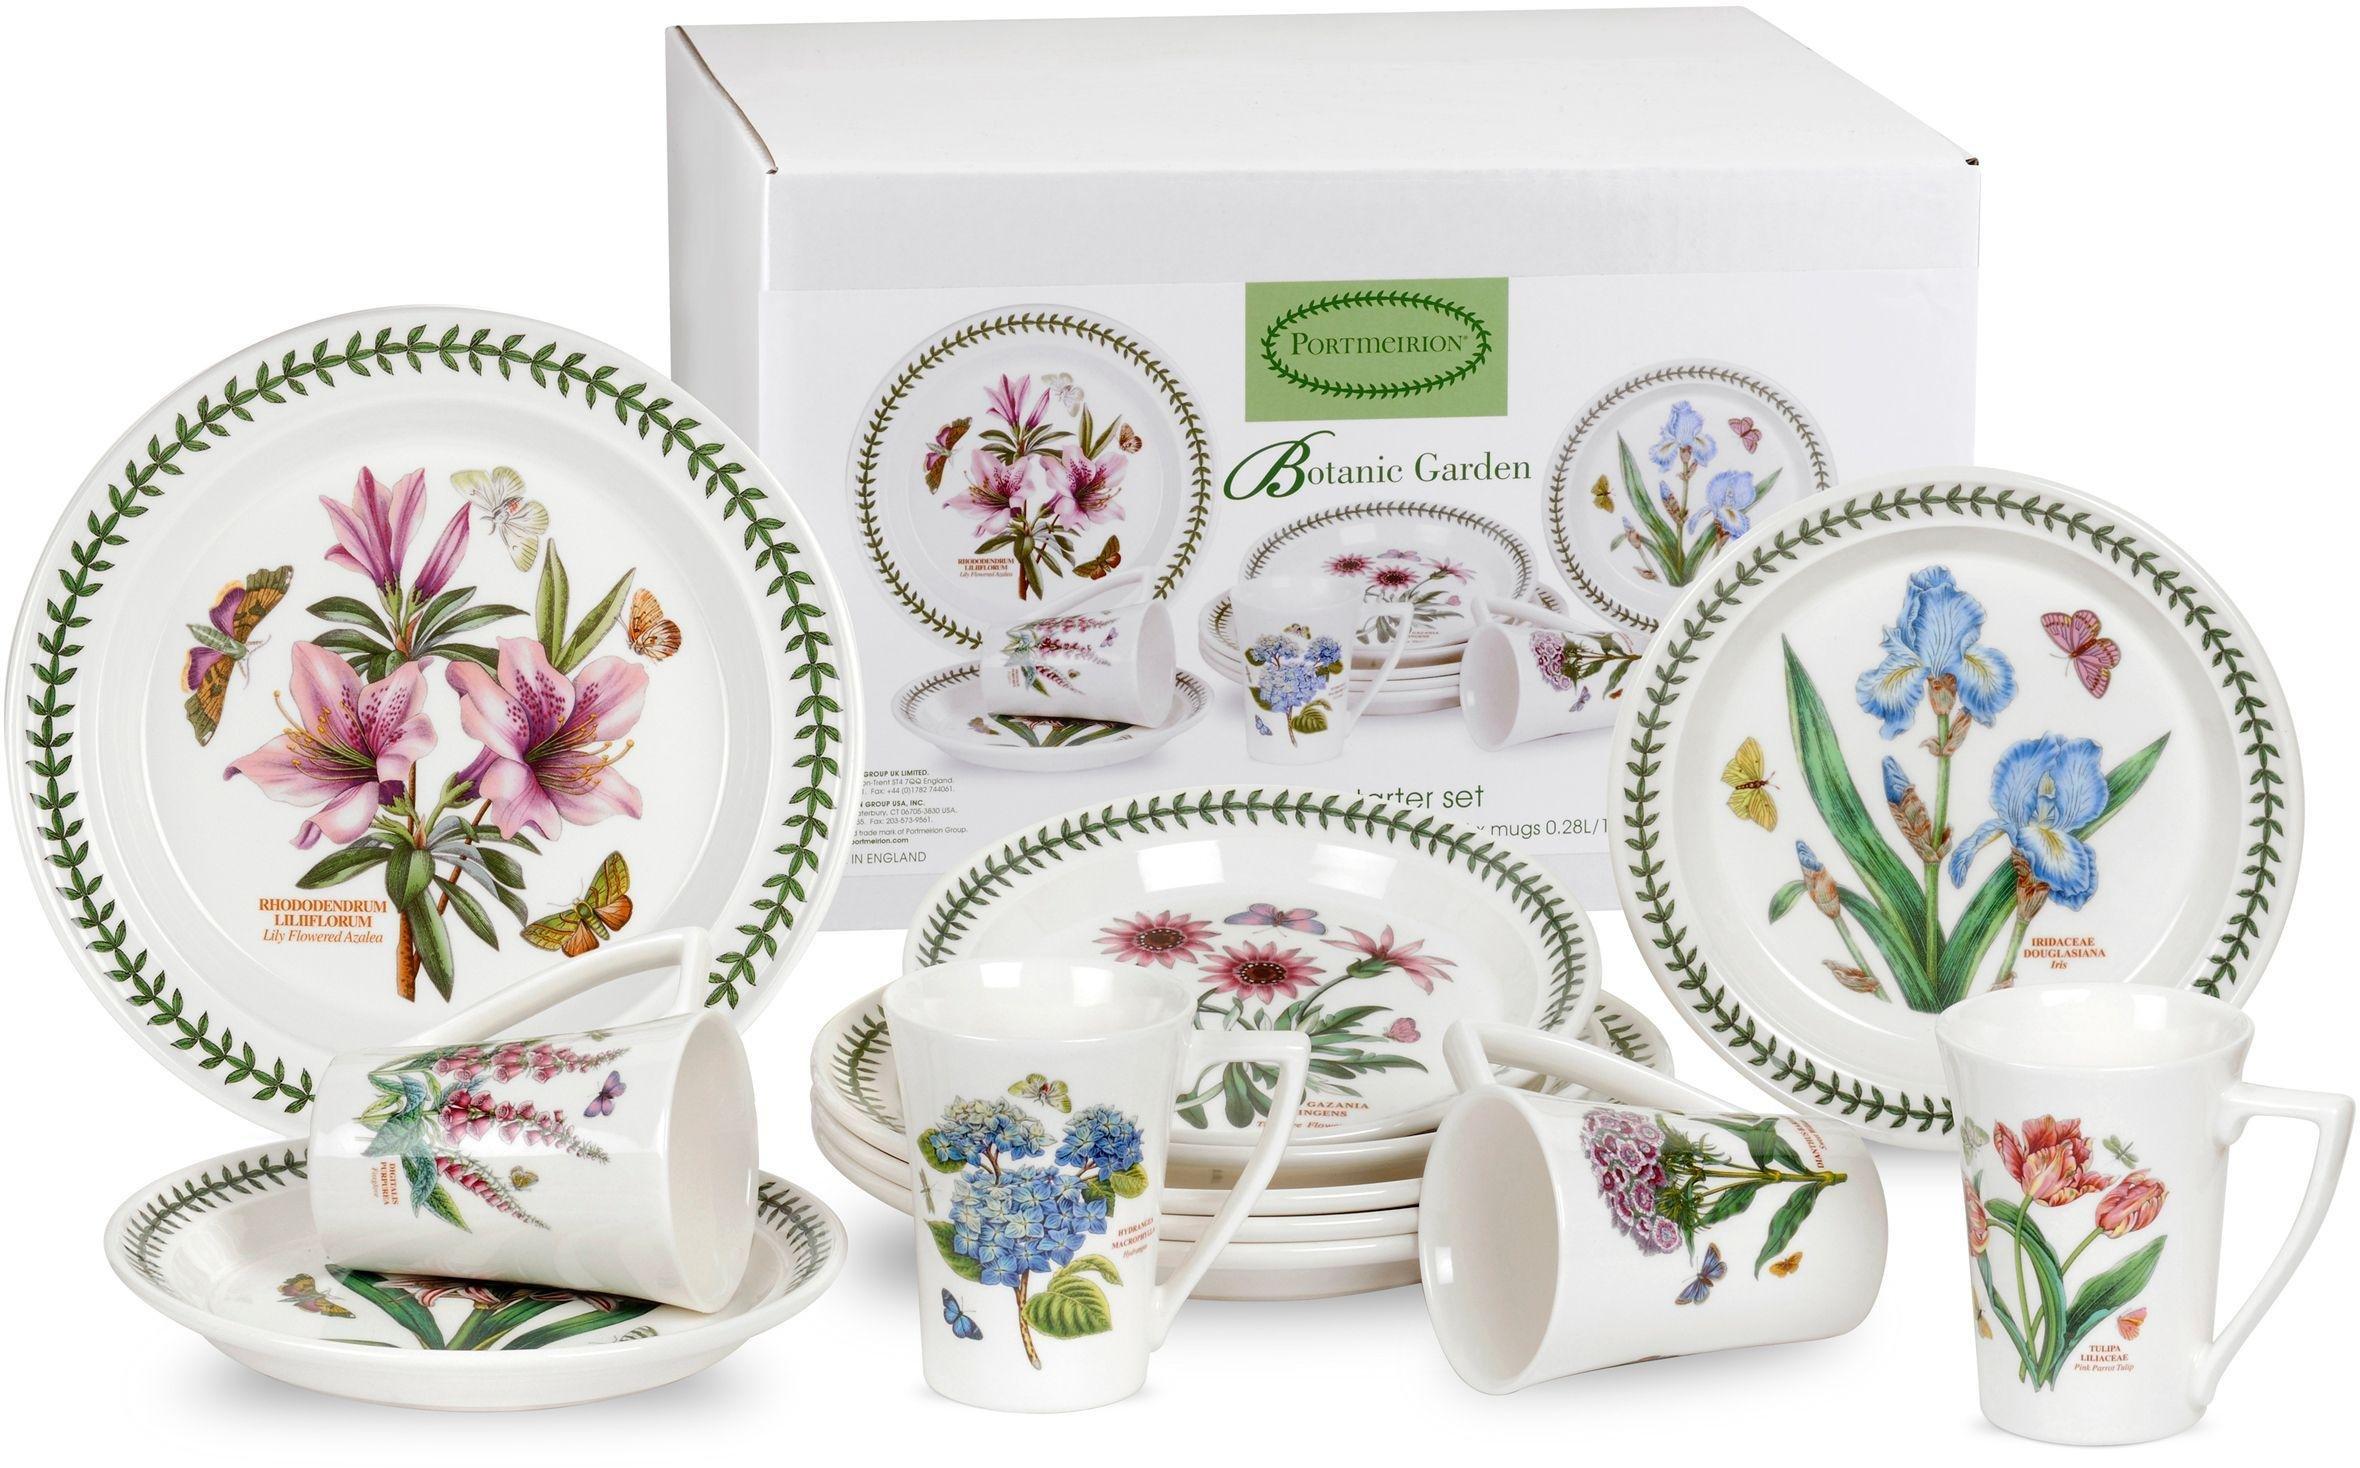 Buy Portmeirion Botanic Garden 12 Piece Ceramic Dinner Set at